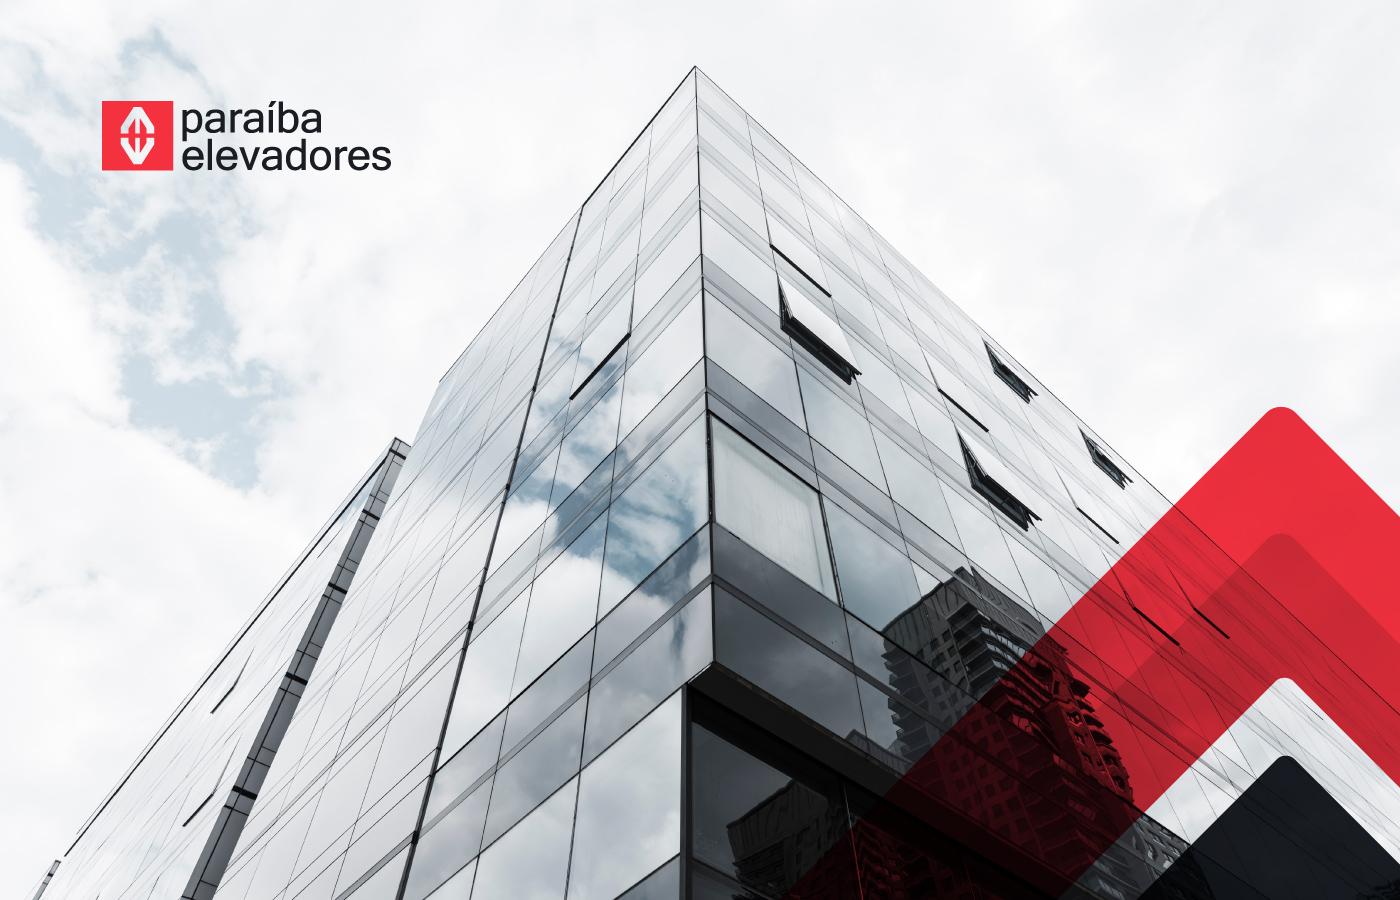 paraiba-1400x900px-01